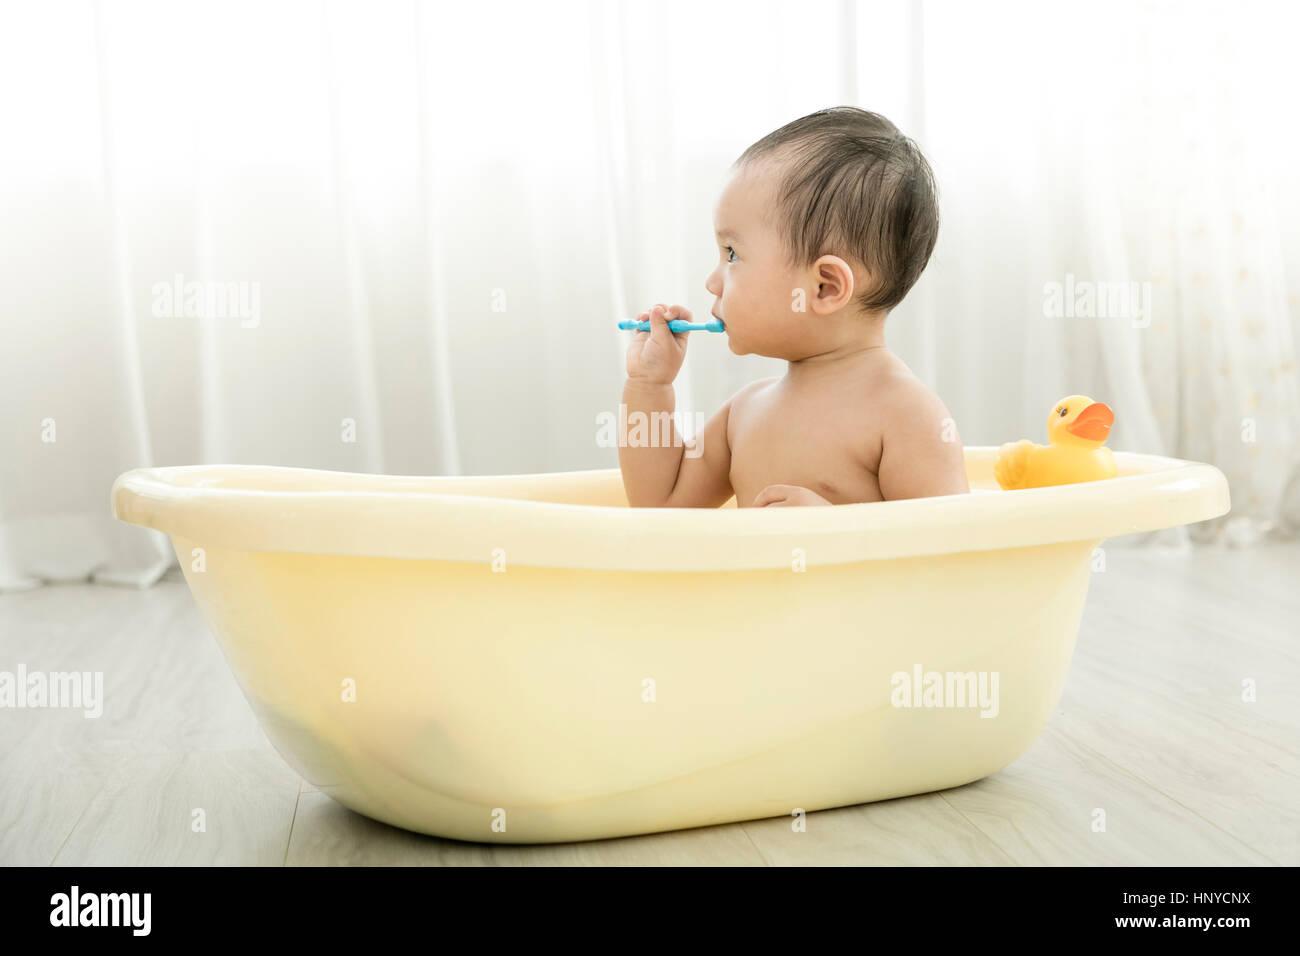 Baby boy in a tub Stock Photo: 133983078 - Alamy